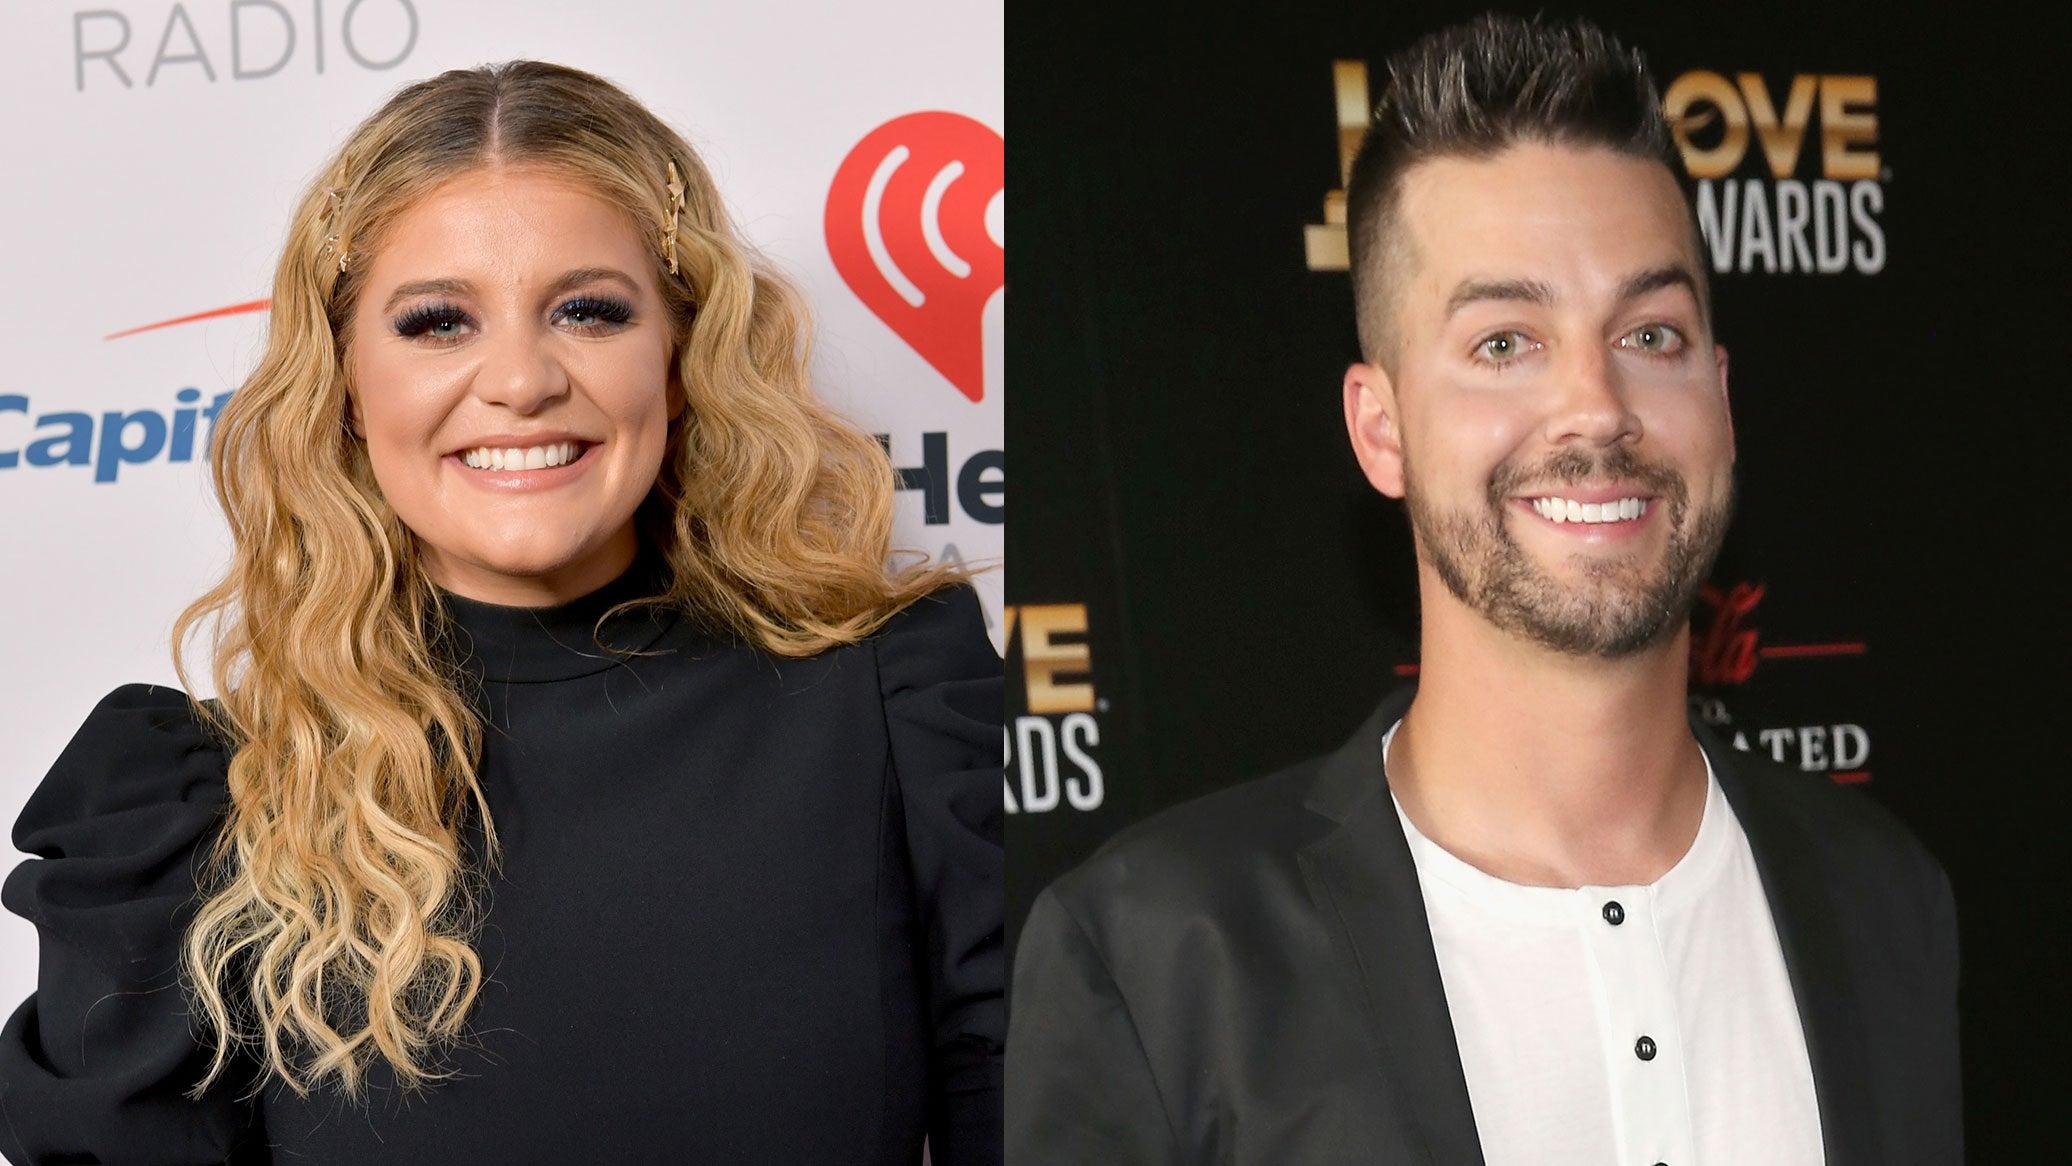 Lauren Alaina Splits With Boyfriend John Crist Ahead of 'Dancing With the Stars' Debut